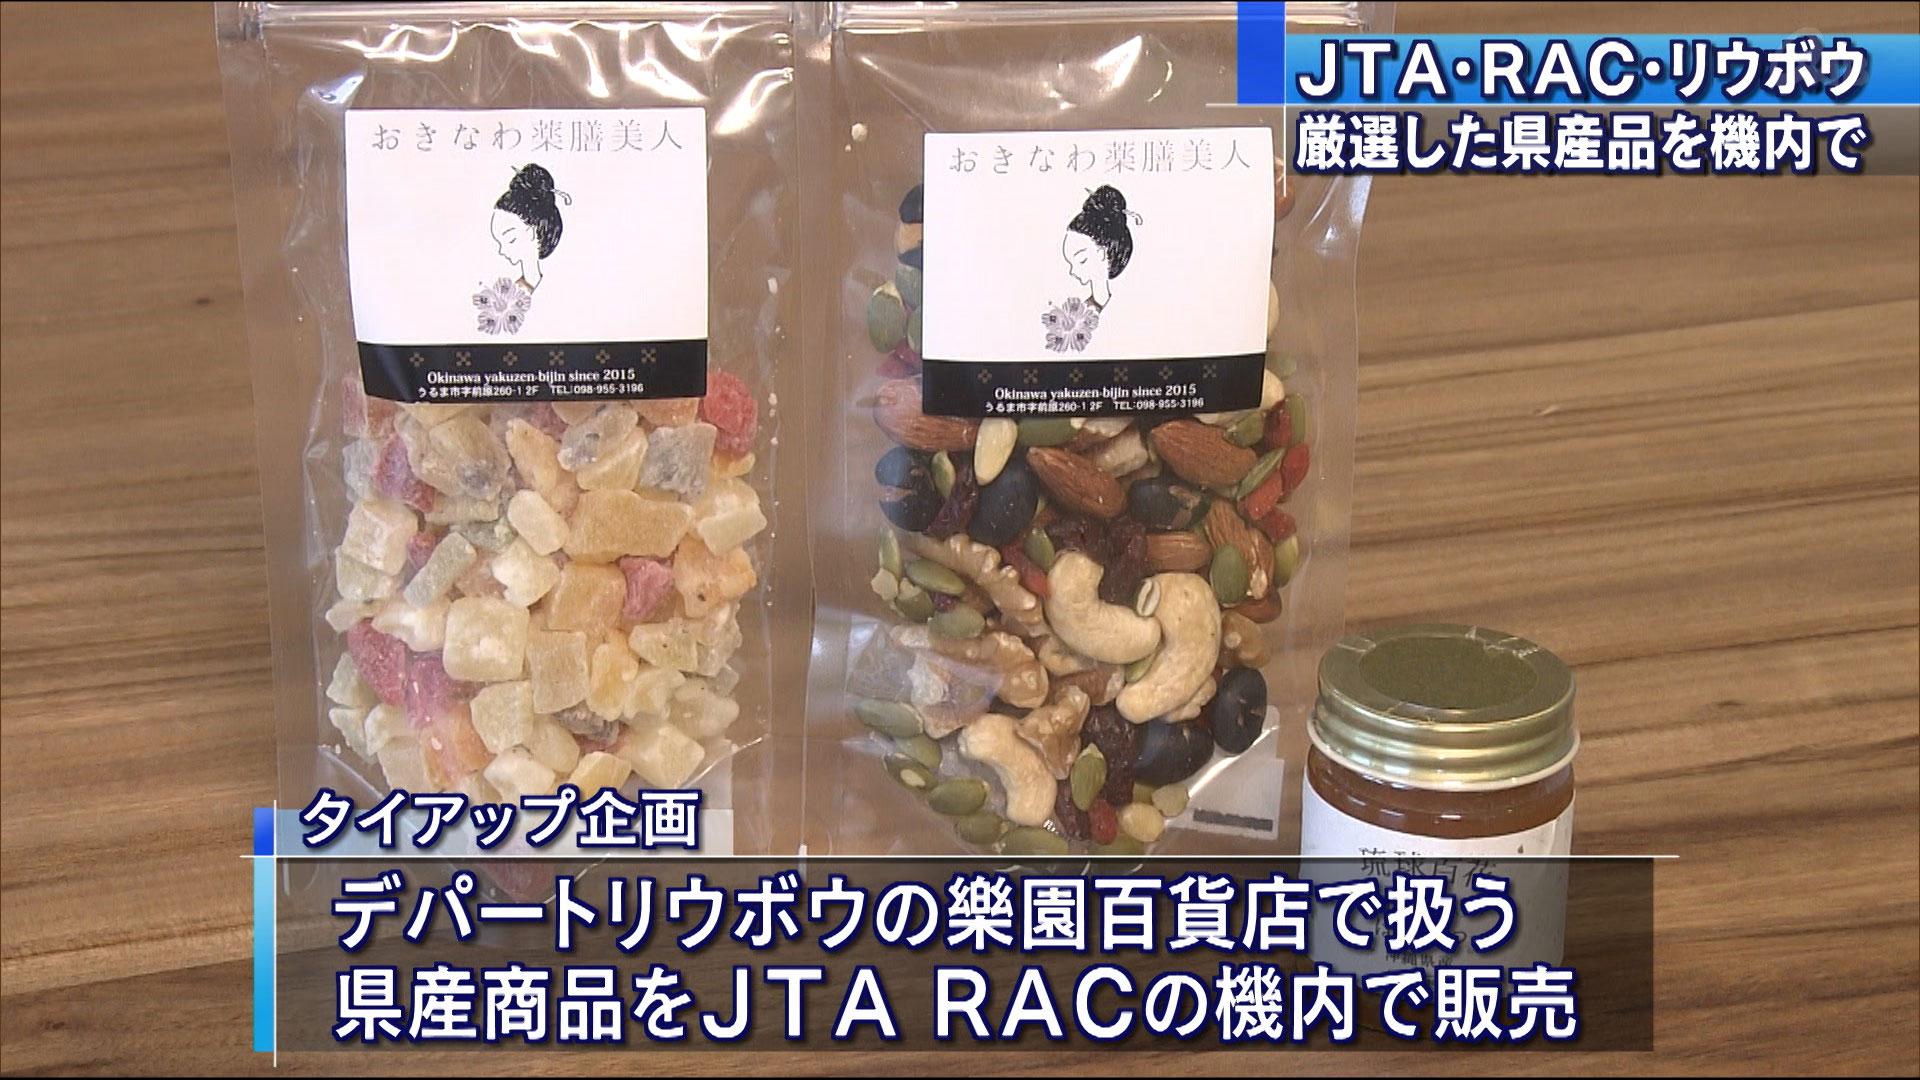 JTA・RAC・リウボウが機内商品でタイアップ